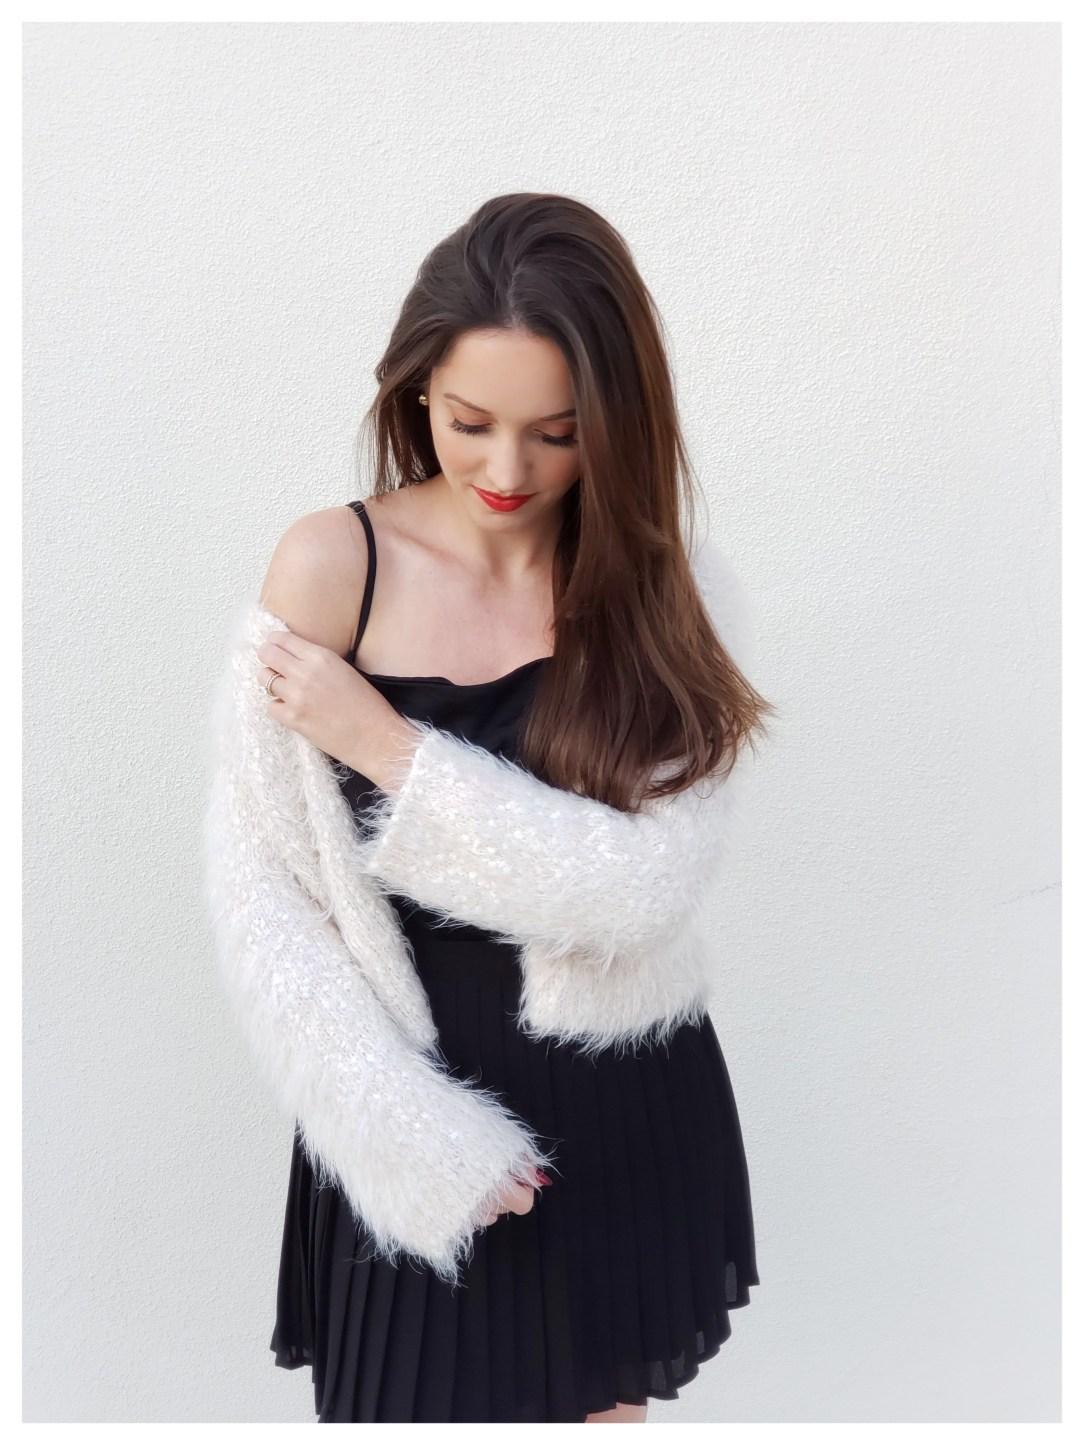 Petite Fashion Blogger Five Foot Feminine in Anthropologie Eyelash Cardigan